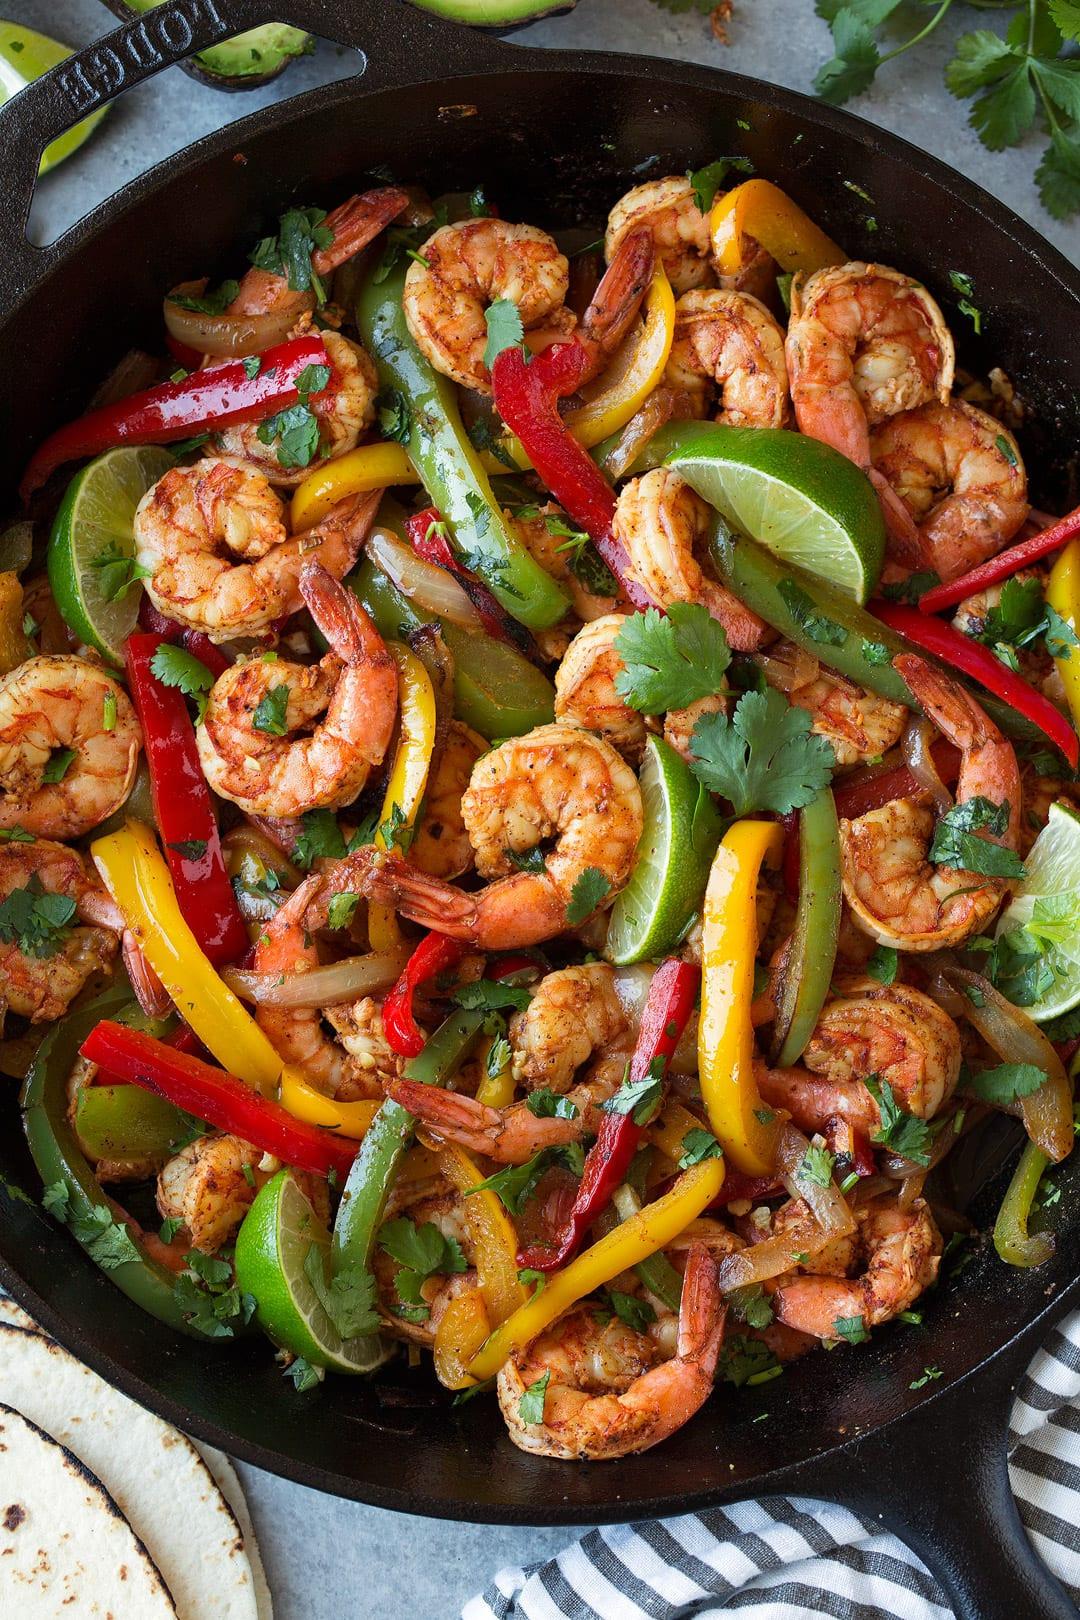 Healthy Shrimp Fajitas  Shrimp Fajitas Easy 25 Minute Recipe Cooking Classy